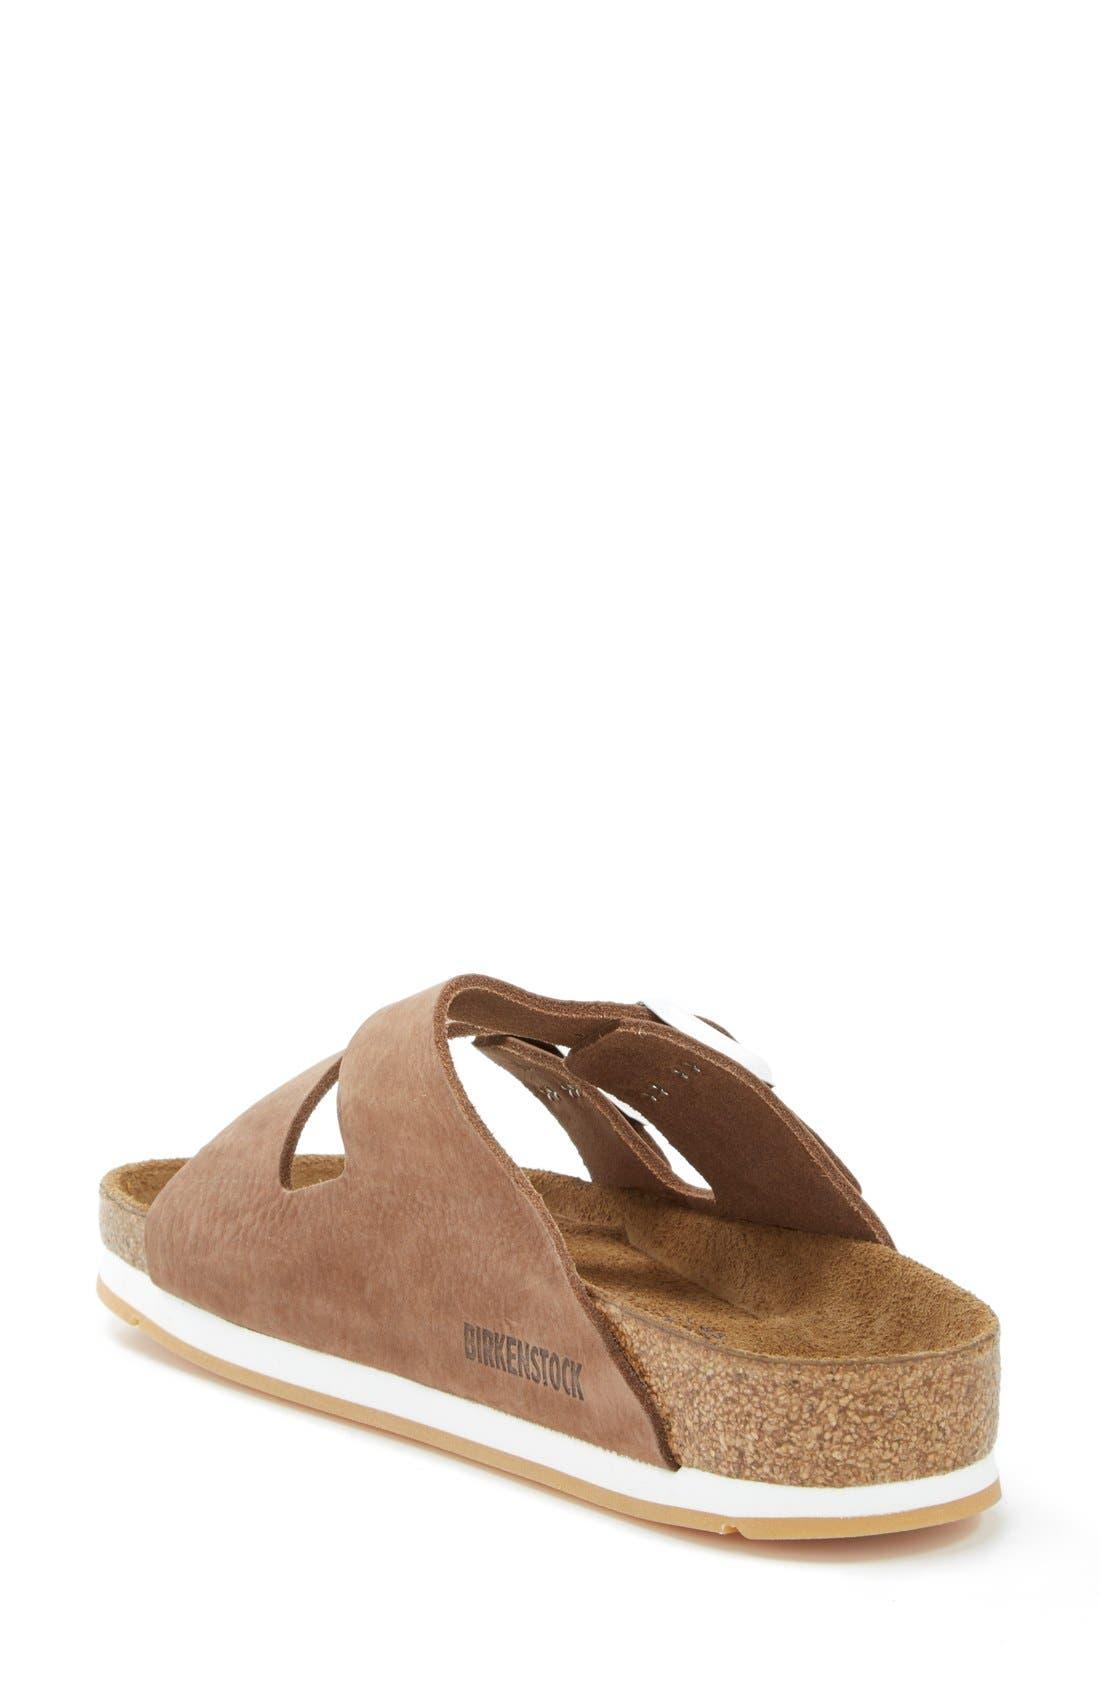 'Arizona' Soft Footbed Sandal,                             Alternate thumbnail 3, color,                             200